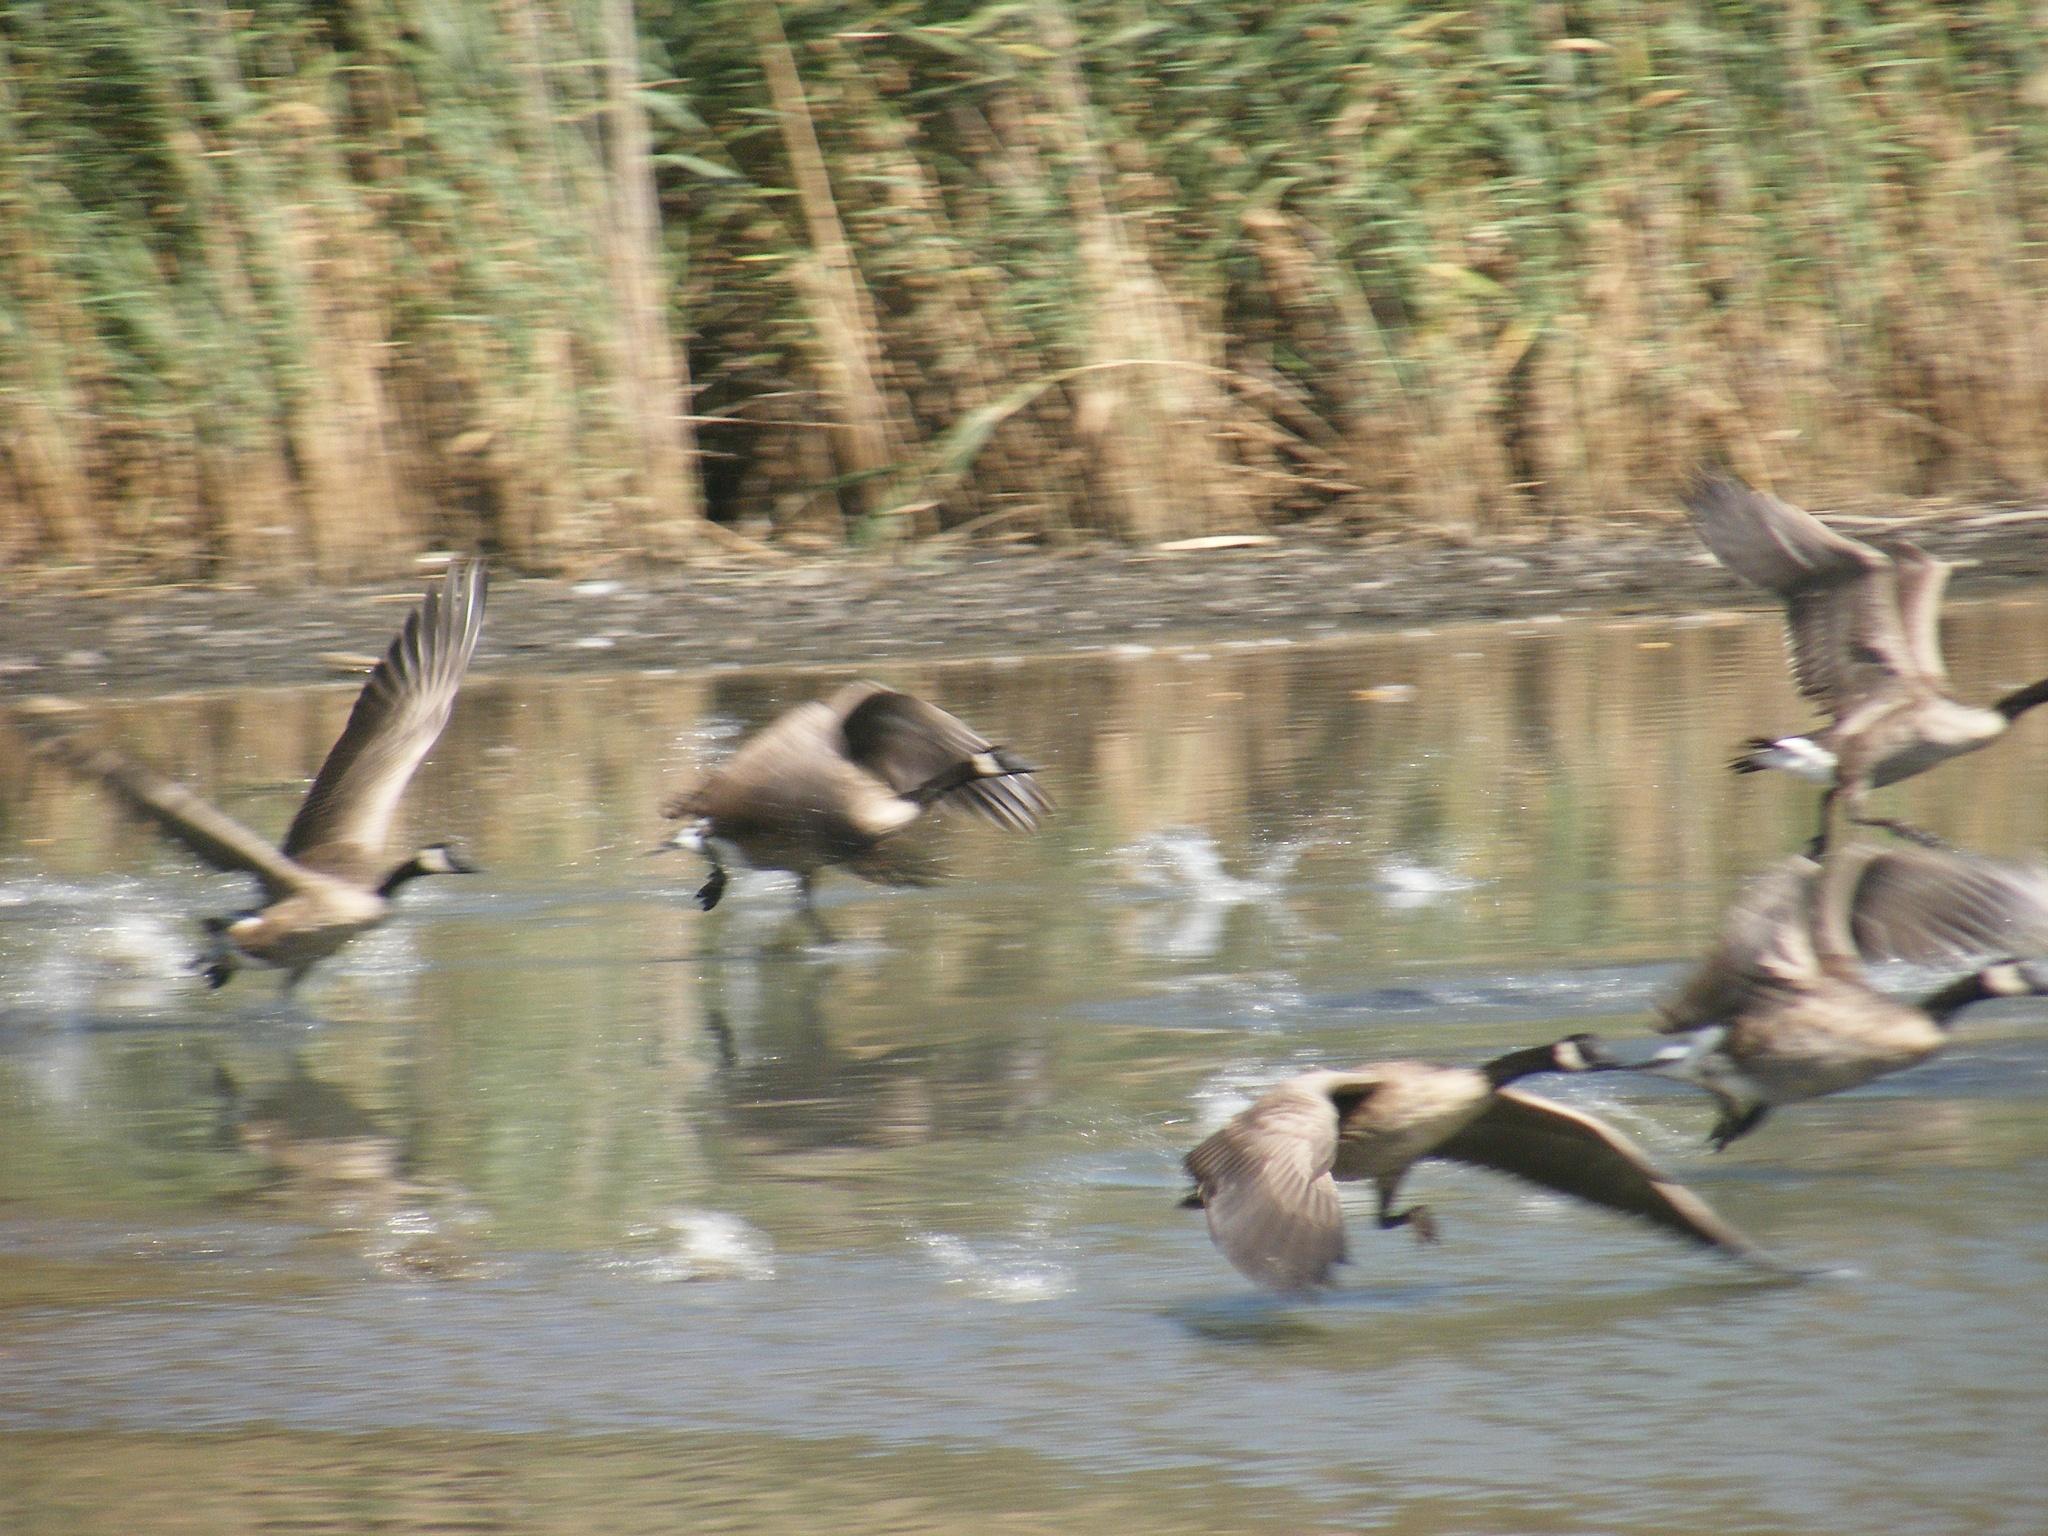 Ducks in Flight by Nicholas Small